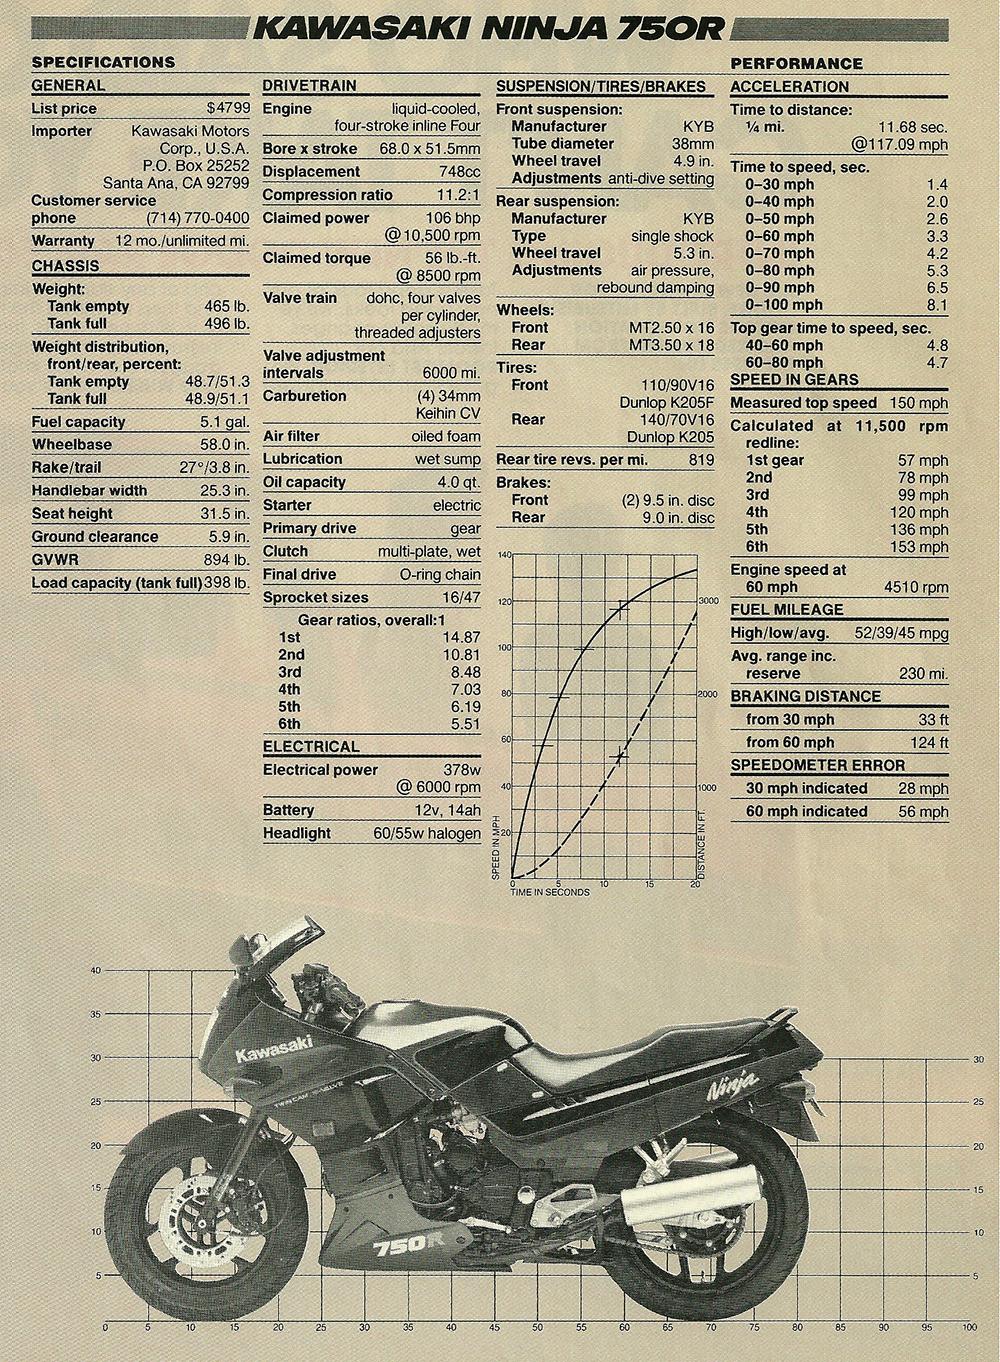 1986 Kawasaki Ninja 750R road test 06.jpg